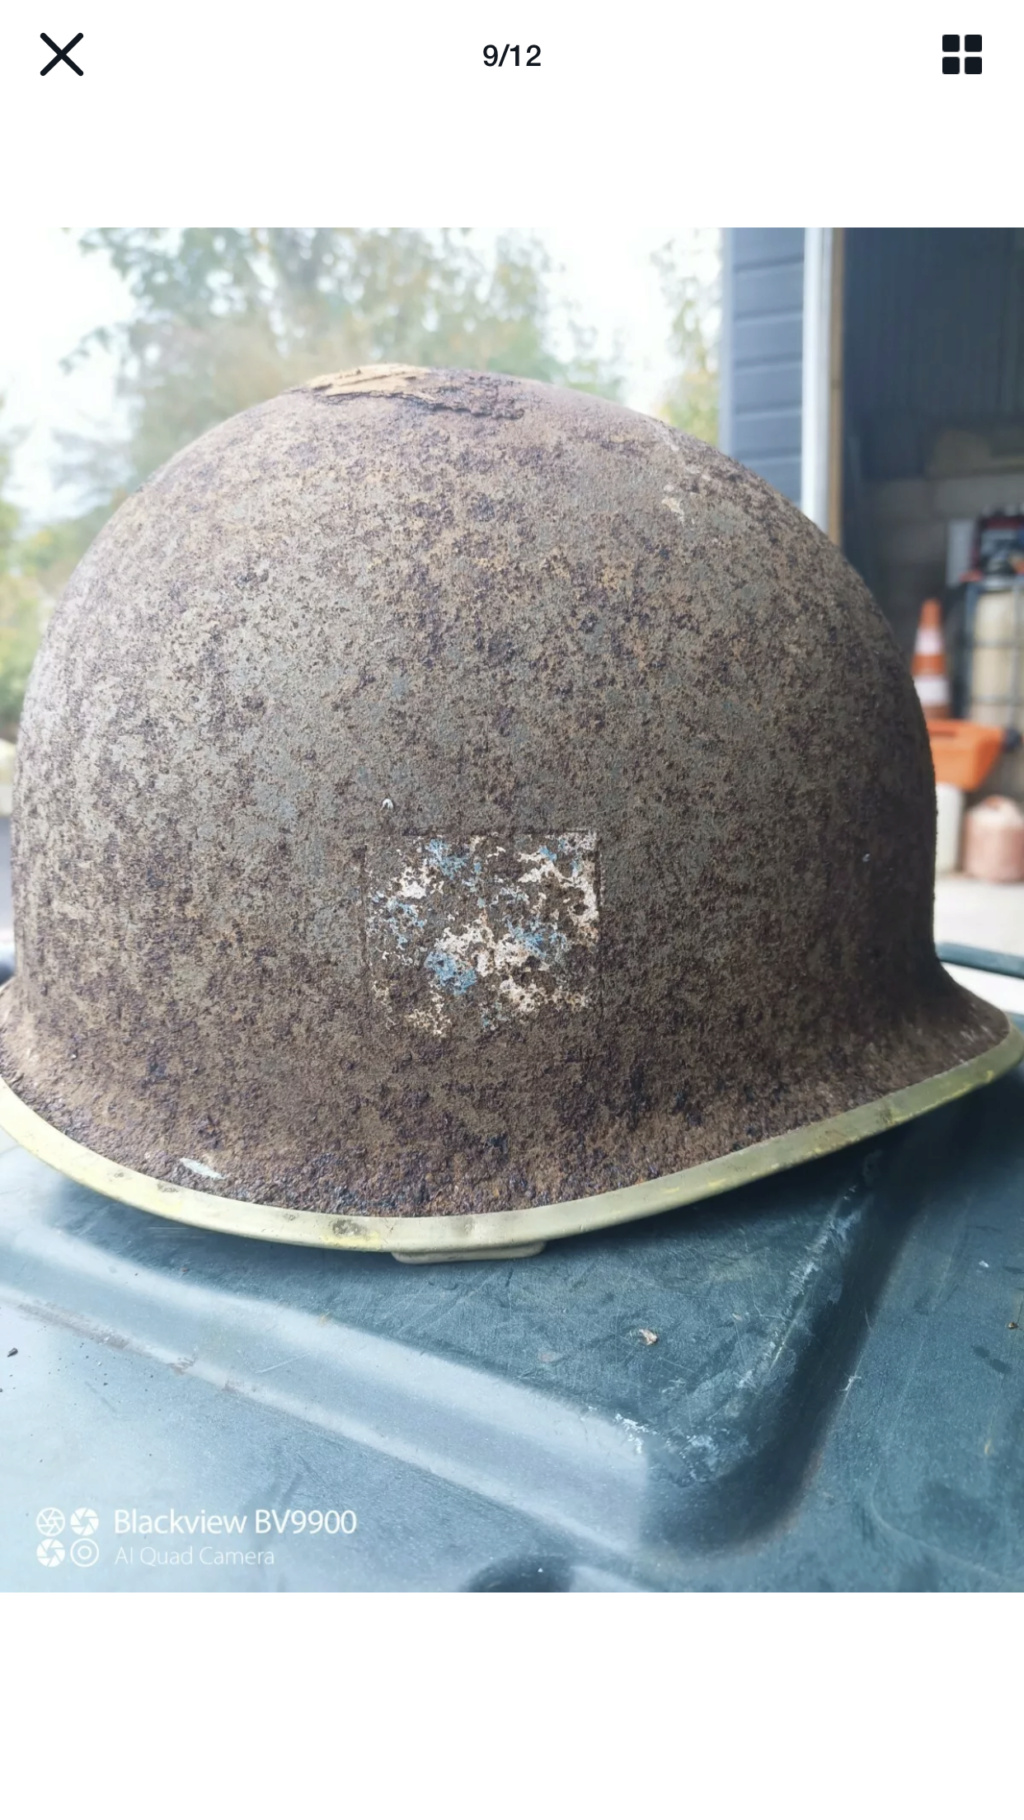 Insigne de casque 3di 7a498810